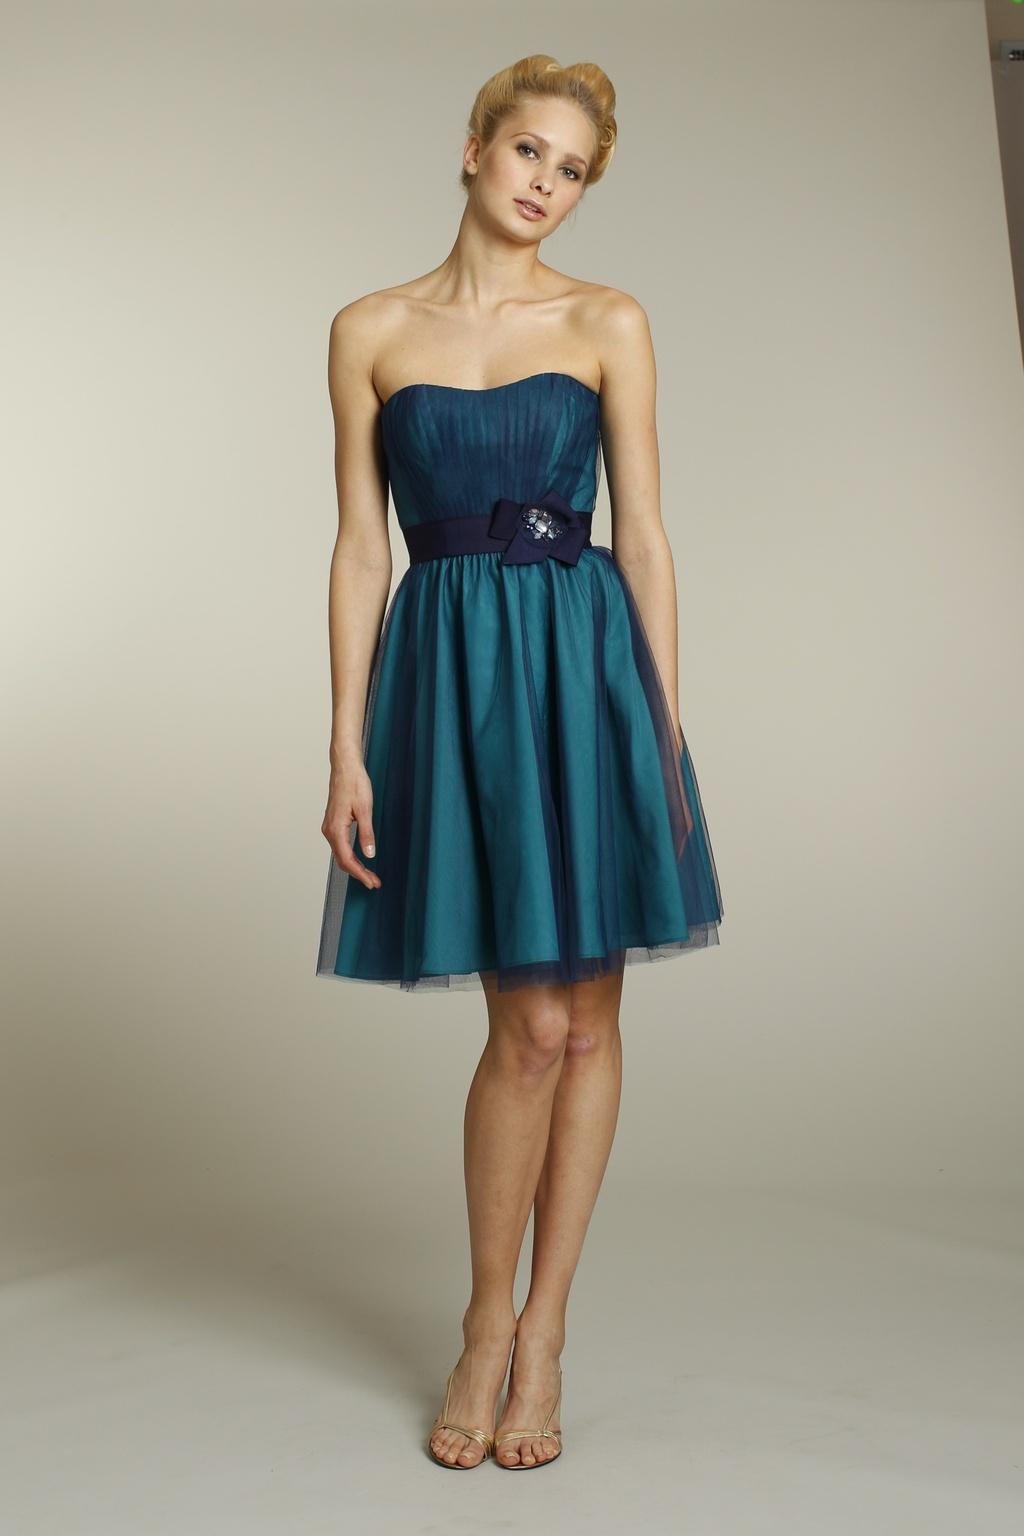 Bridesmaids-dresses-jlm-fall-2011-gowns-5163-teal.full